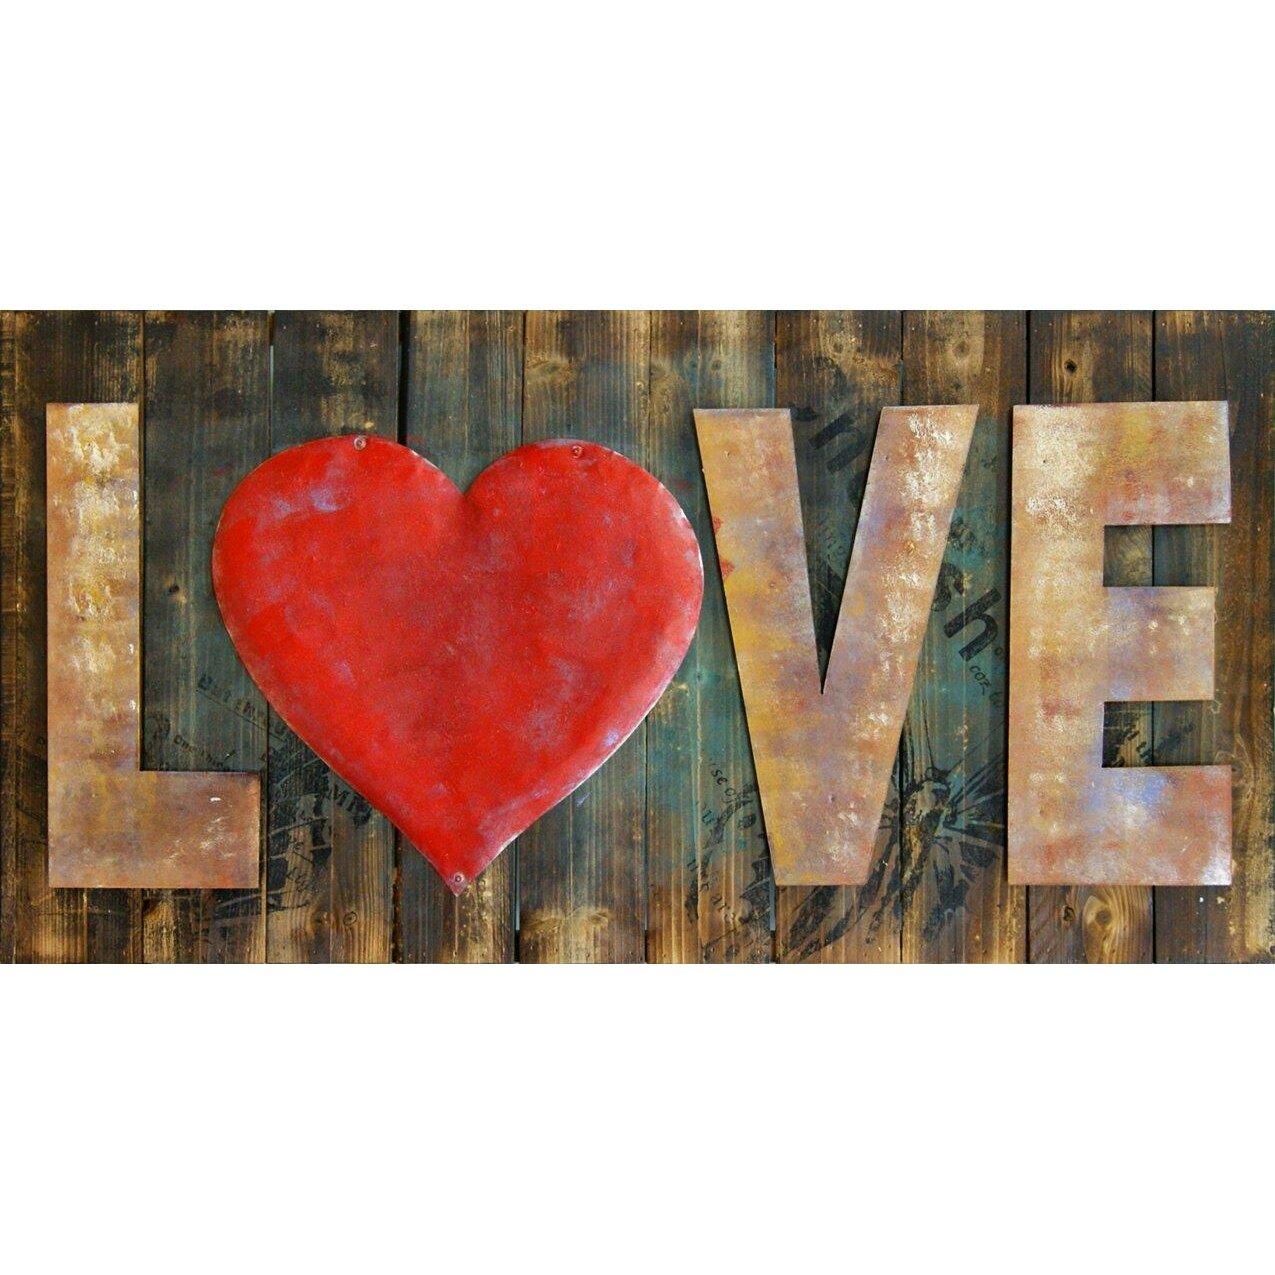 Red Love Wall Decor : Hdc international d love red heart wall decor reviews